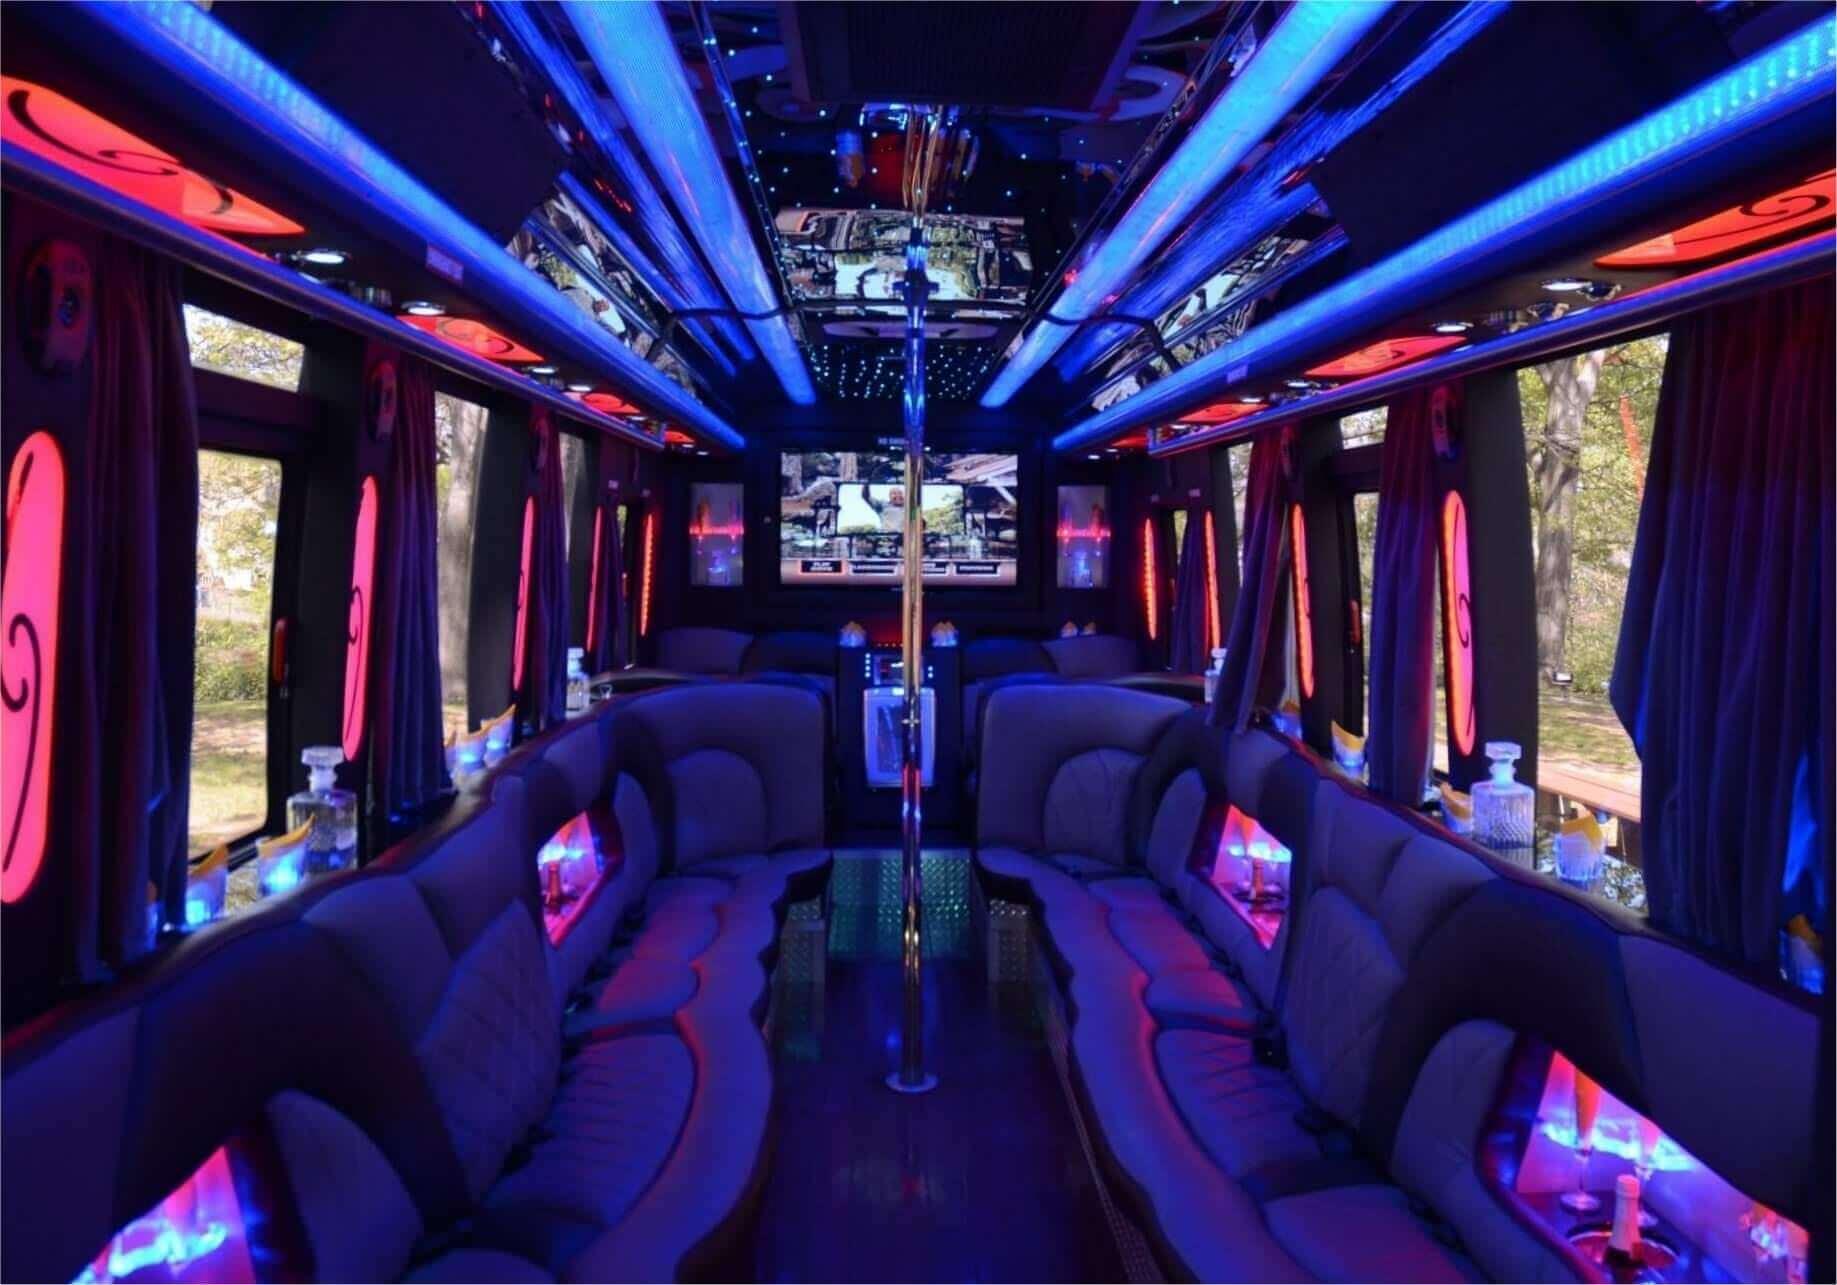 Party Bus - 15 Passengers Image